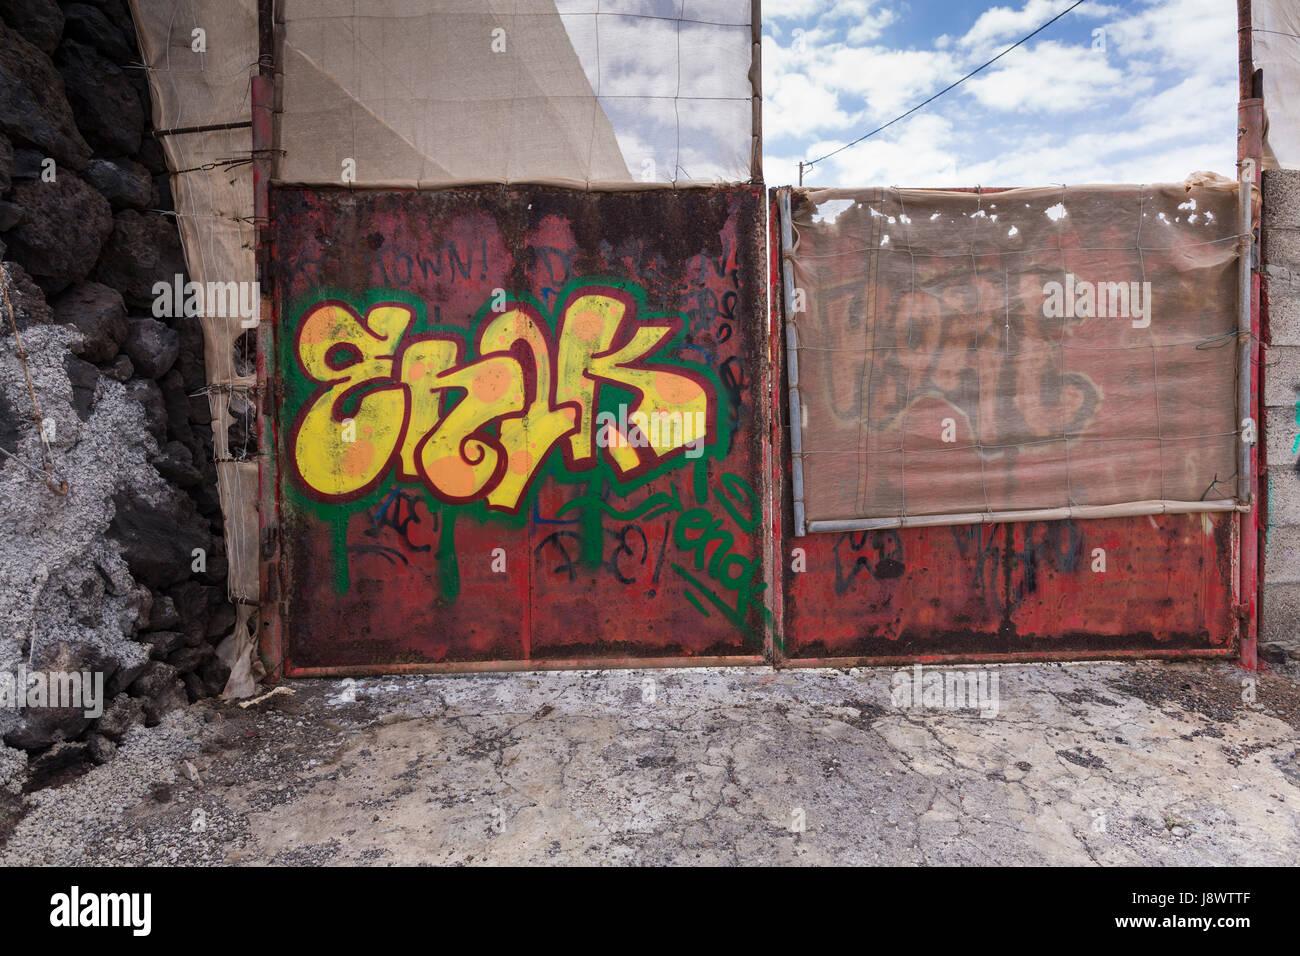 Graffiti painted with name enok on metal gate in playa san juan tenerife canary